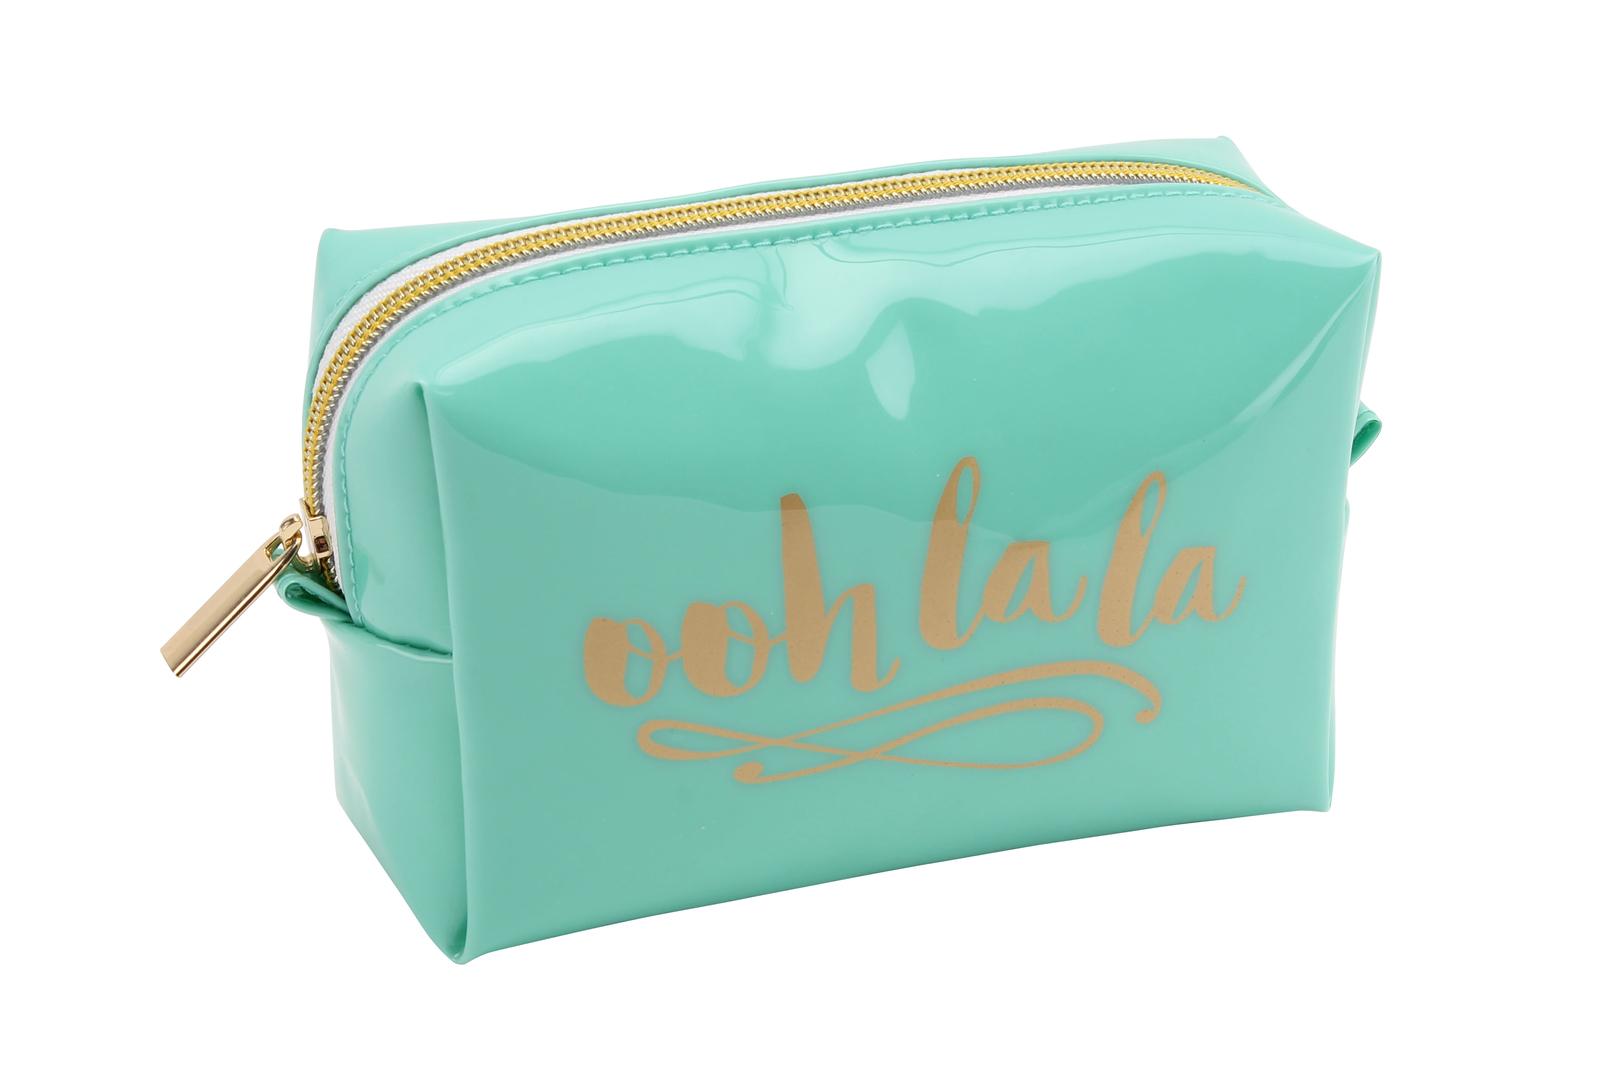 Oh So Pretty - Ooh La La Cosmetic Bag image